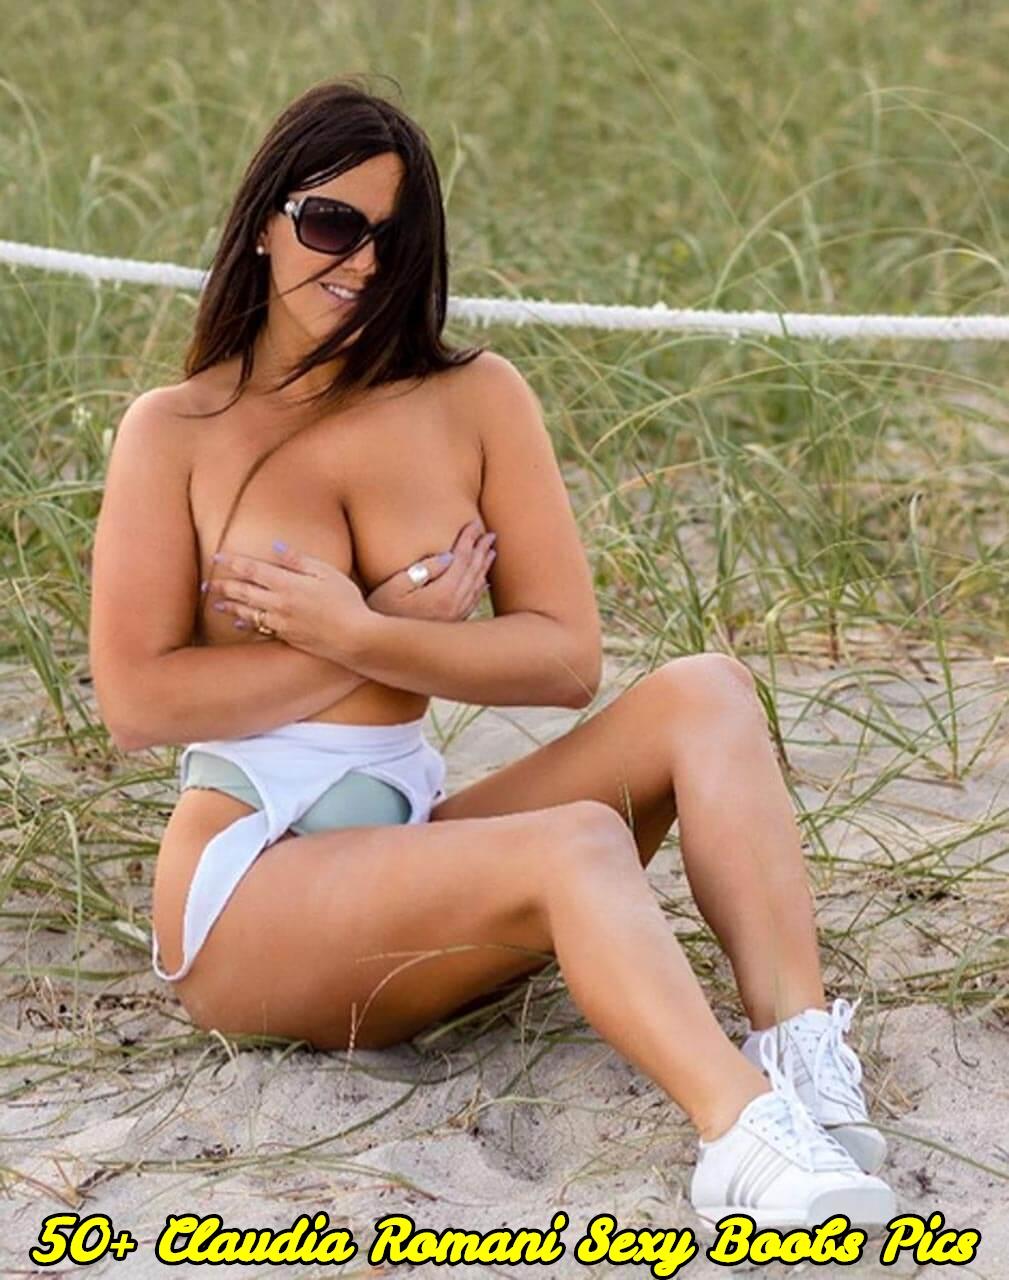 Claudia Romani sexy boobs pics